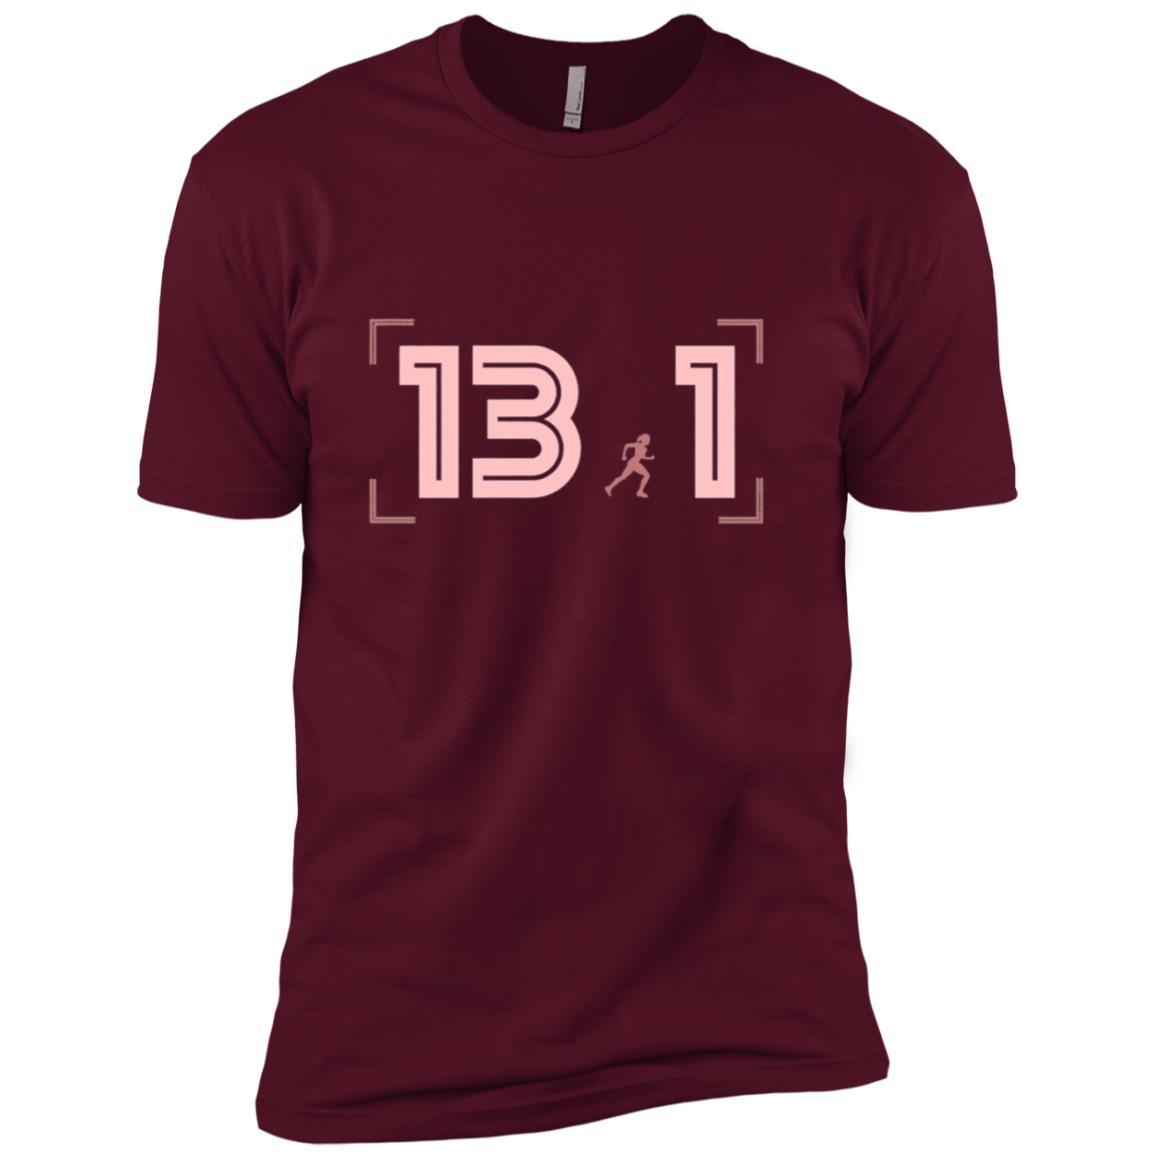 Half-Marathon Running 13.1 Premium Men Short Sleeve T-Shirt